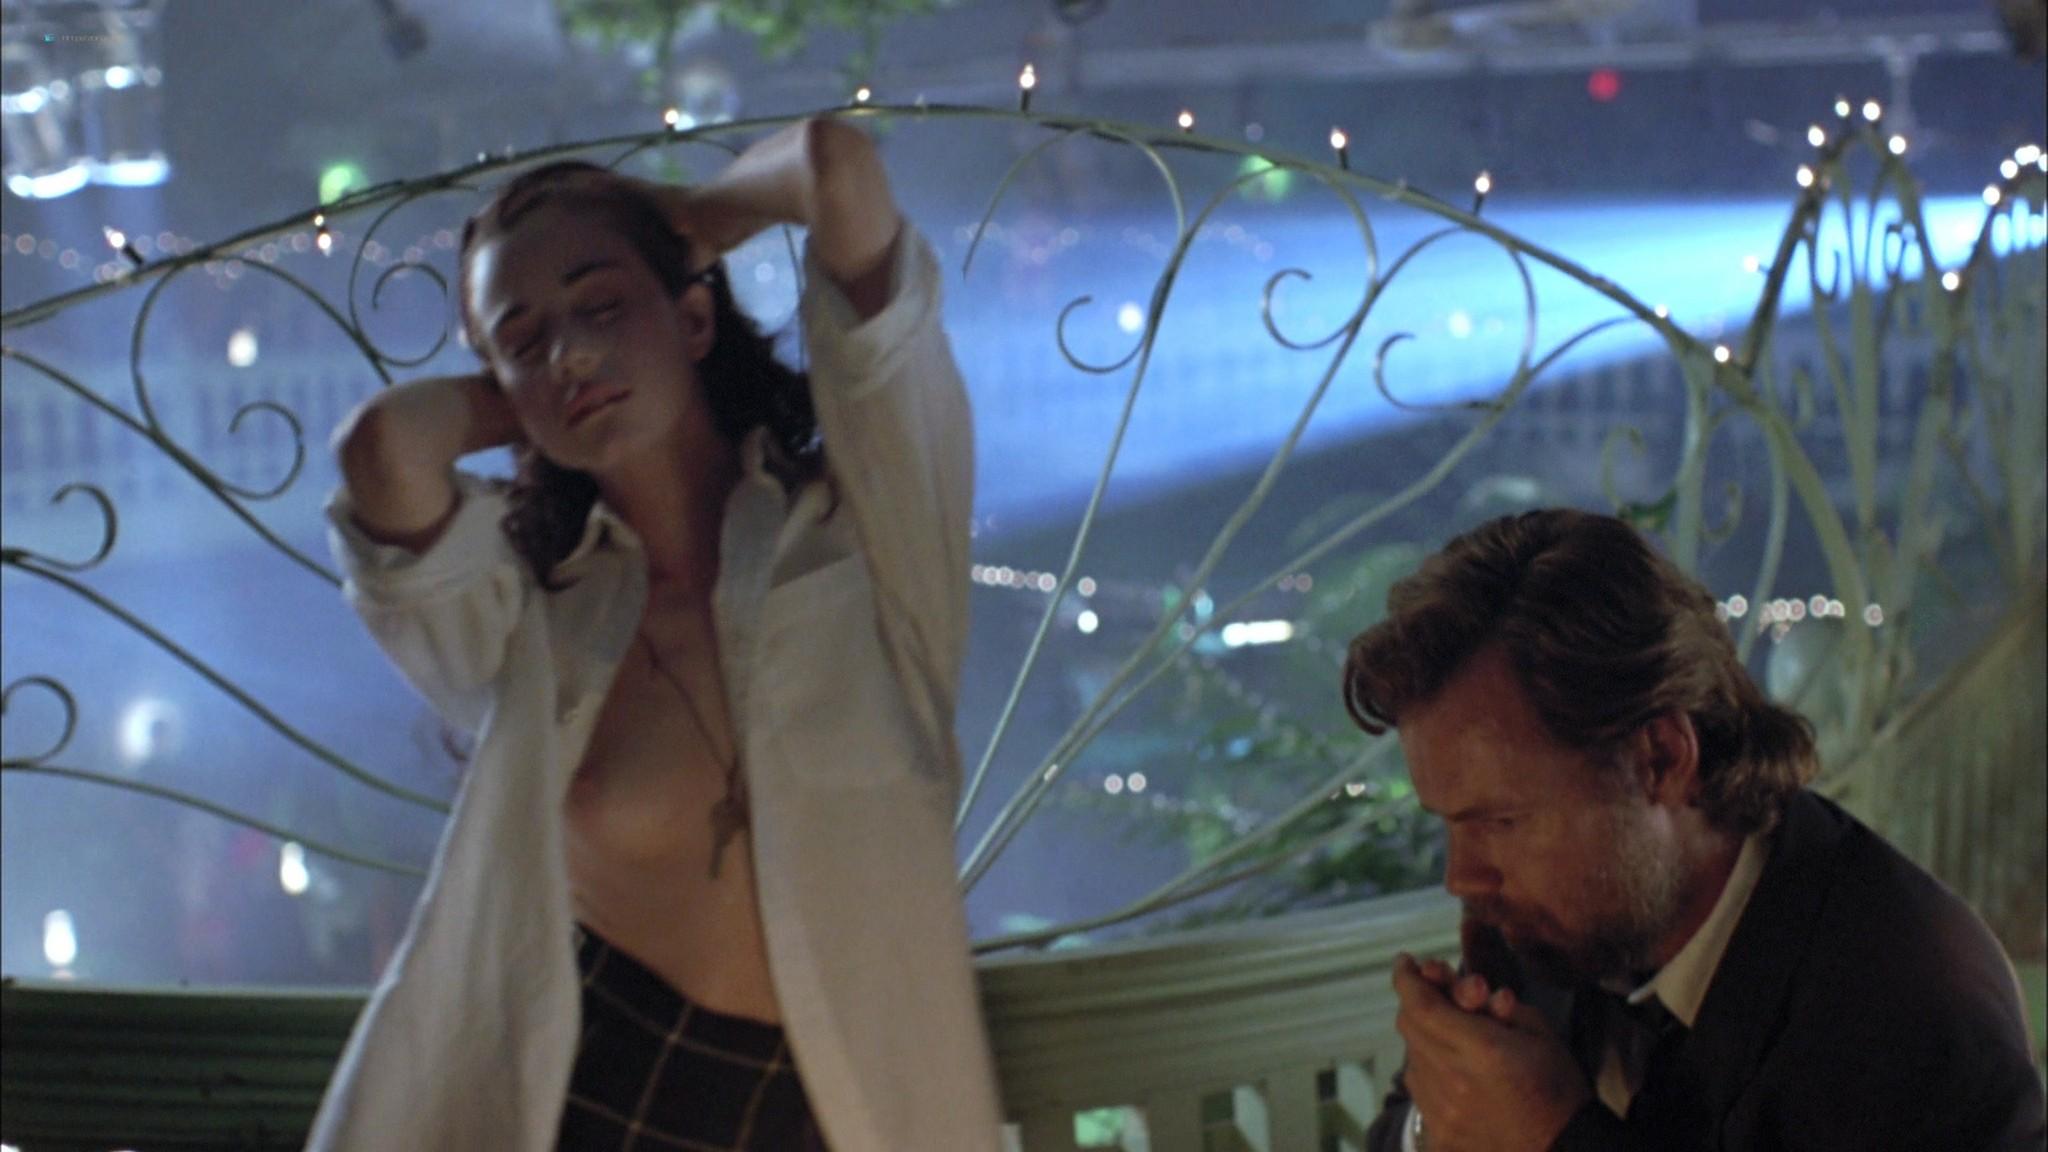 Mia Kirshner nude Arsinée Khanjian sexy - Exotica (1994) HD 1080p BluRay REMUX (11)